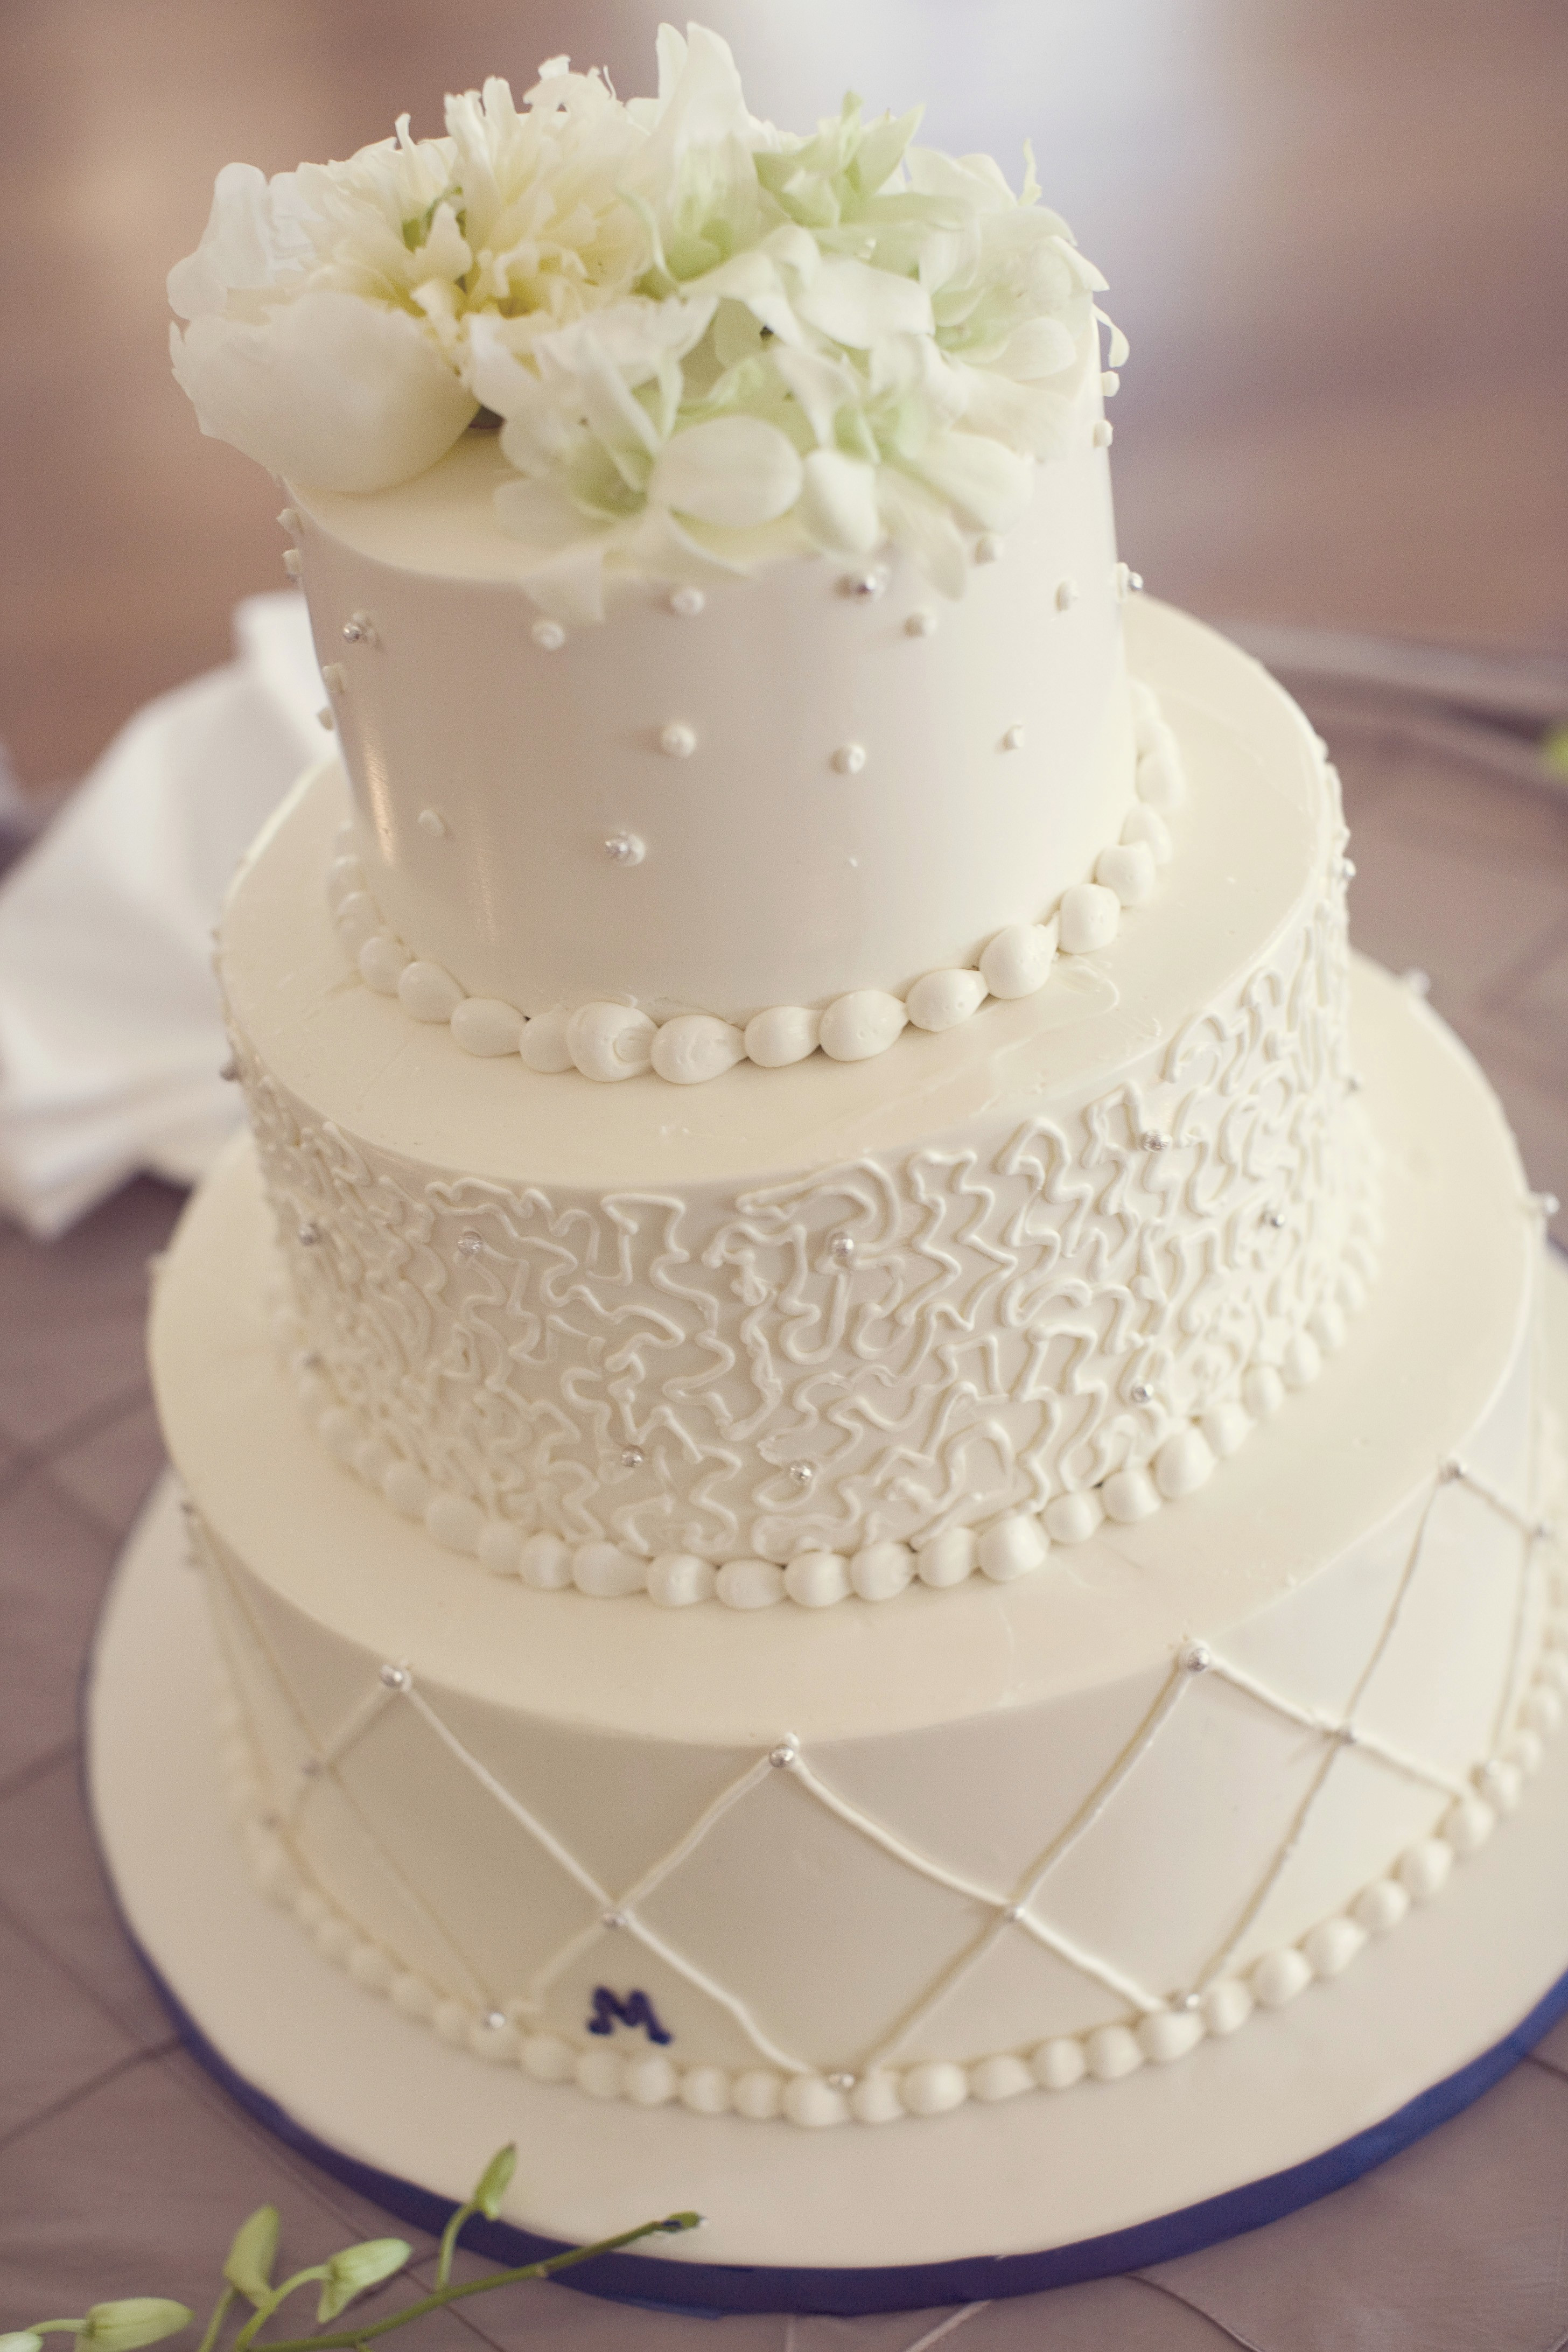 Wedding Cakes With Buttercream Icing  New Extraordinary Wedding Cake buttercream Project Bruman